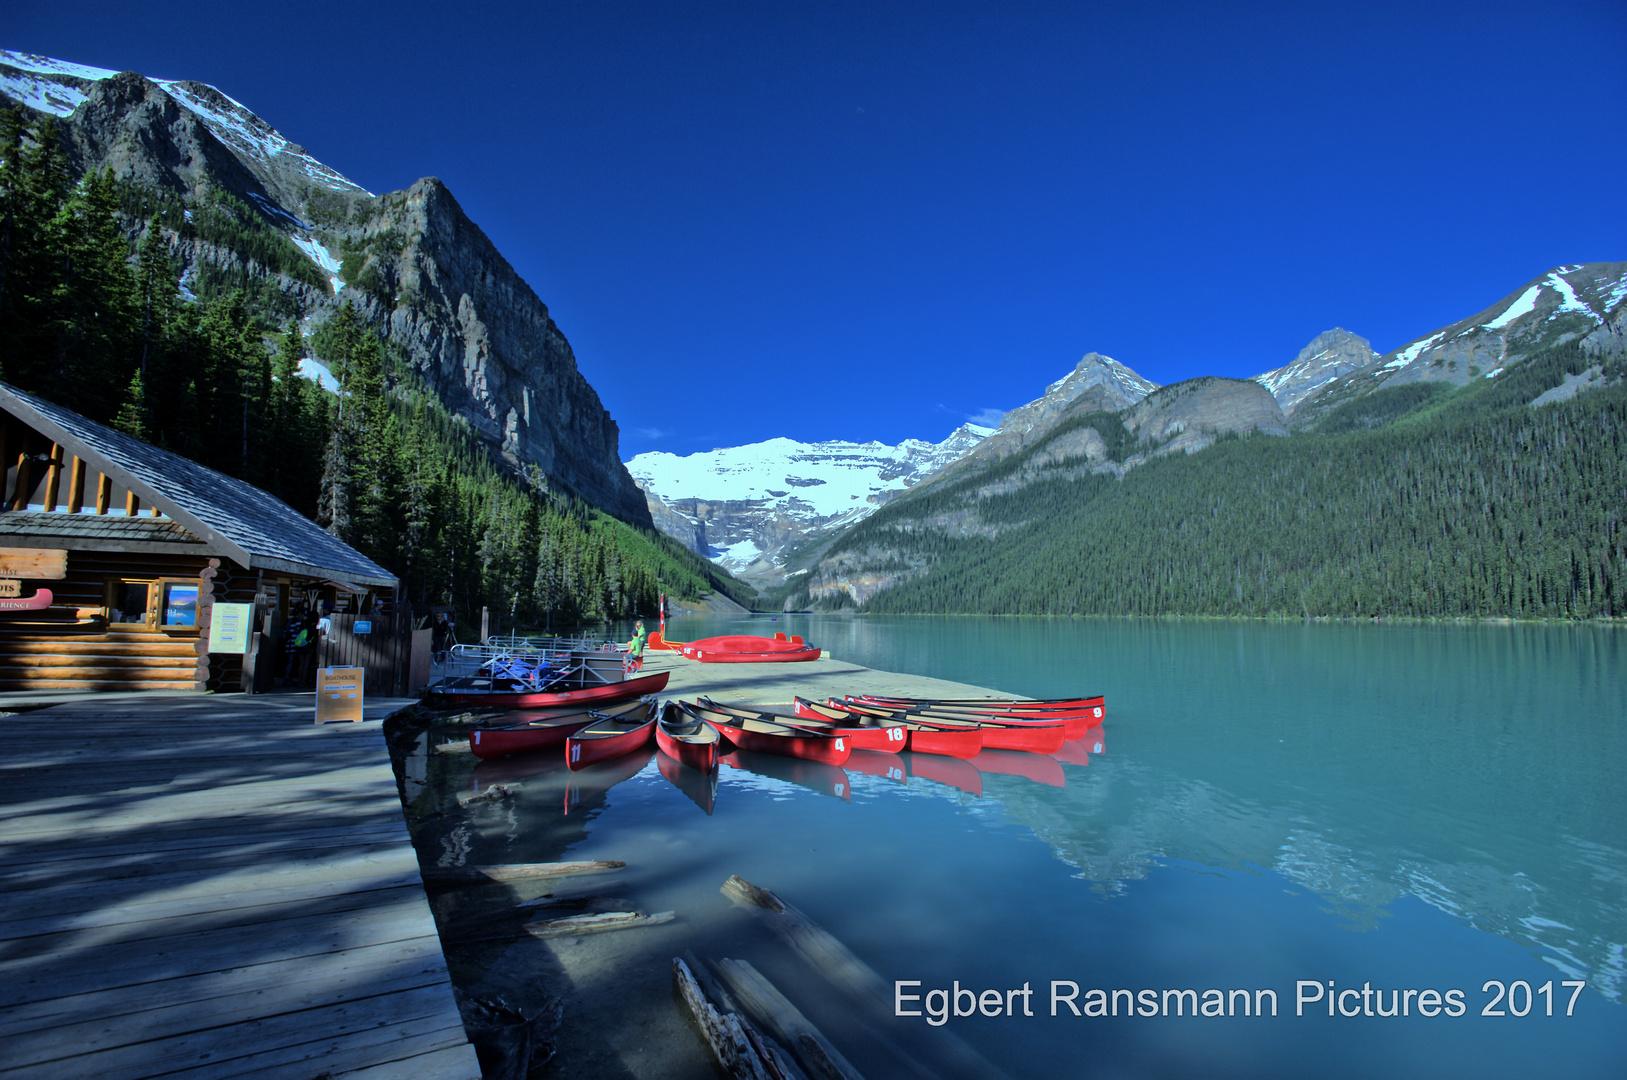 Lake Louise / Canada 2017